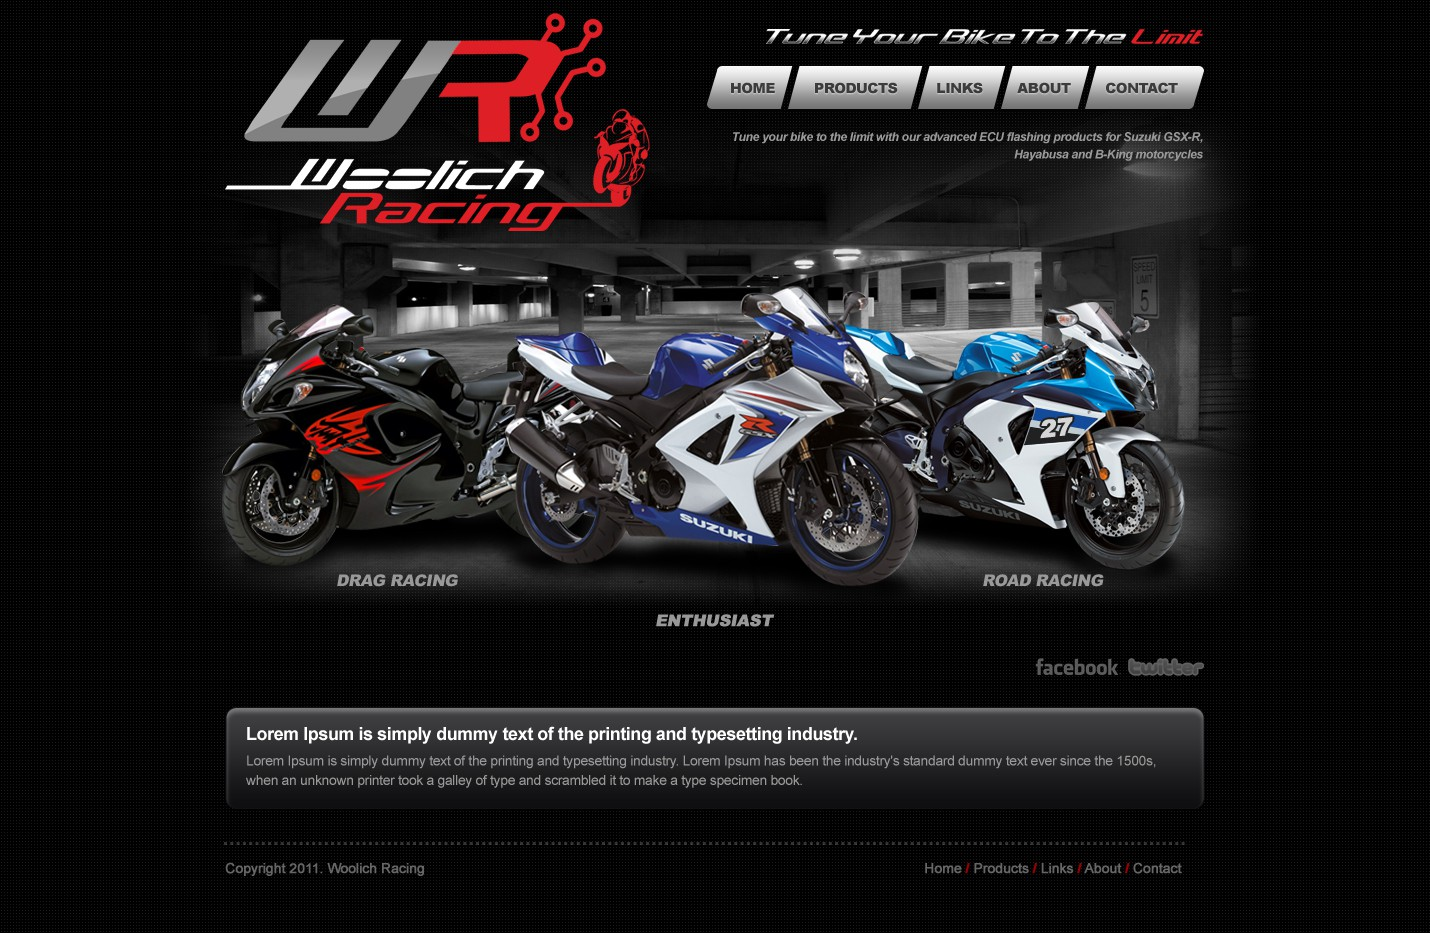 Woolich Racing needs a new website design